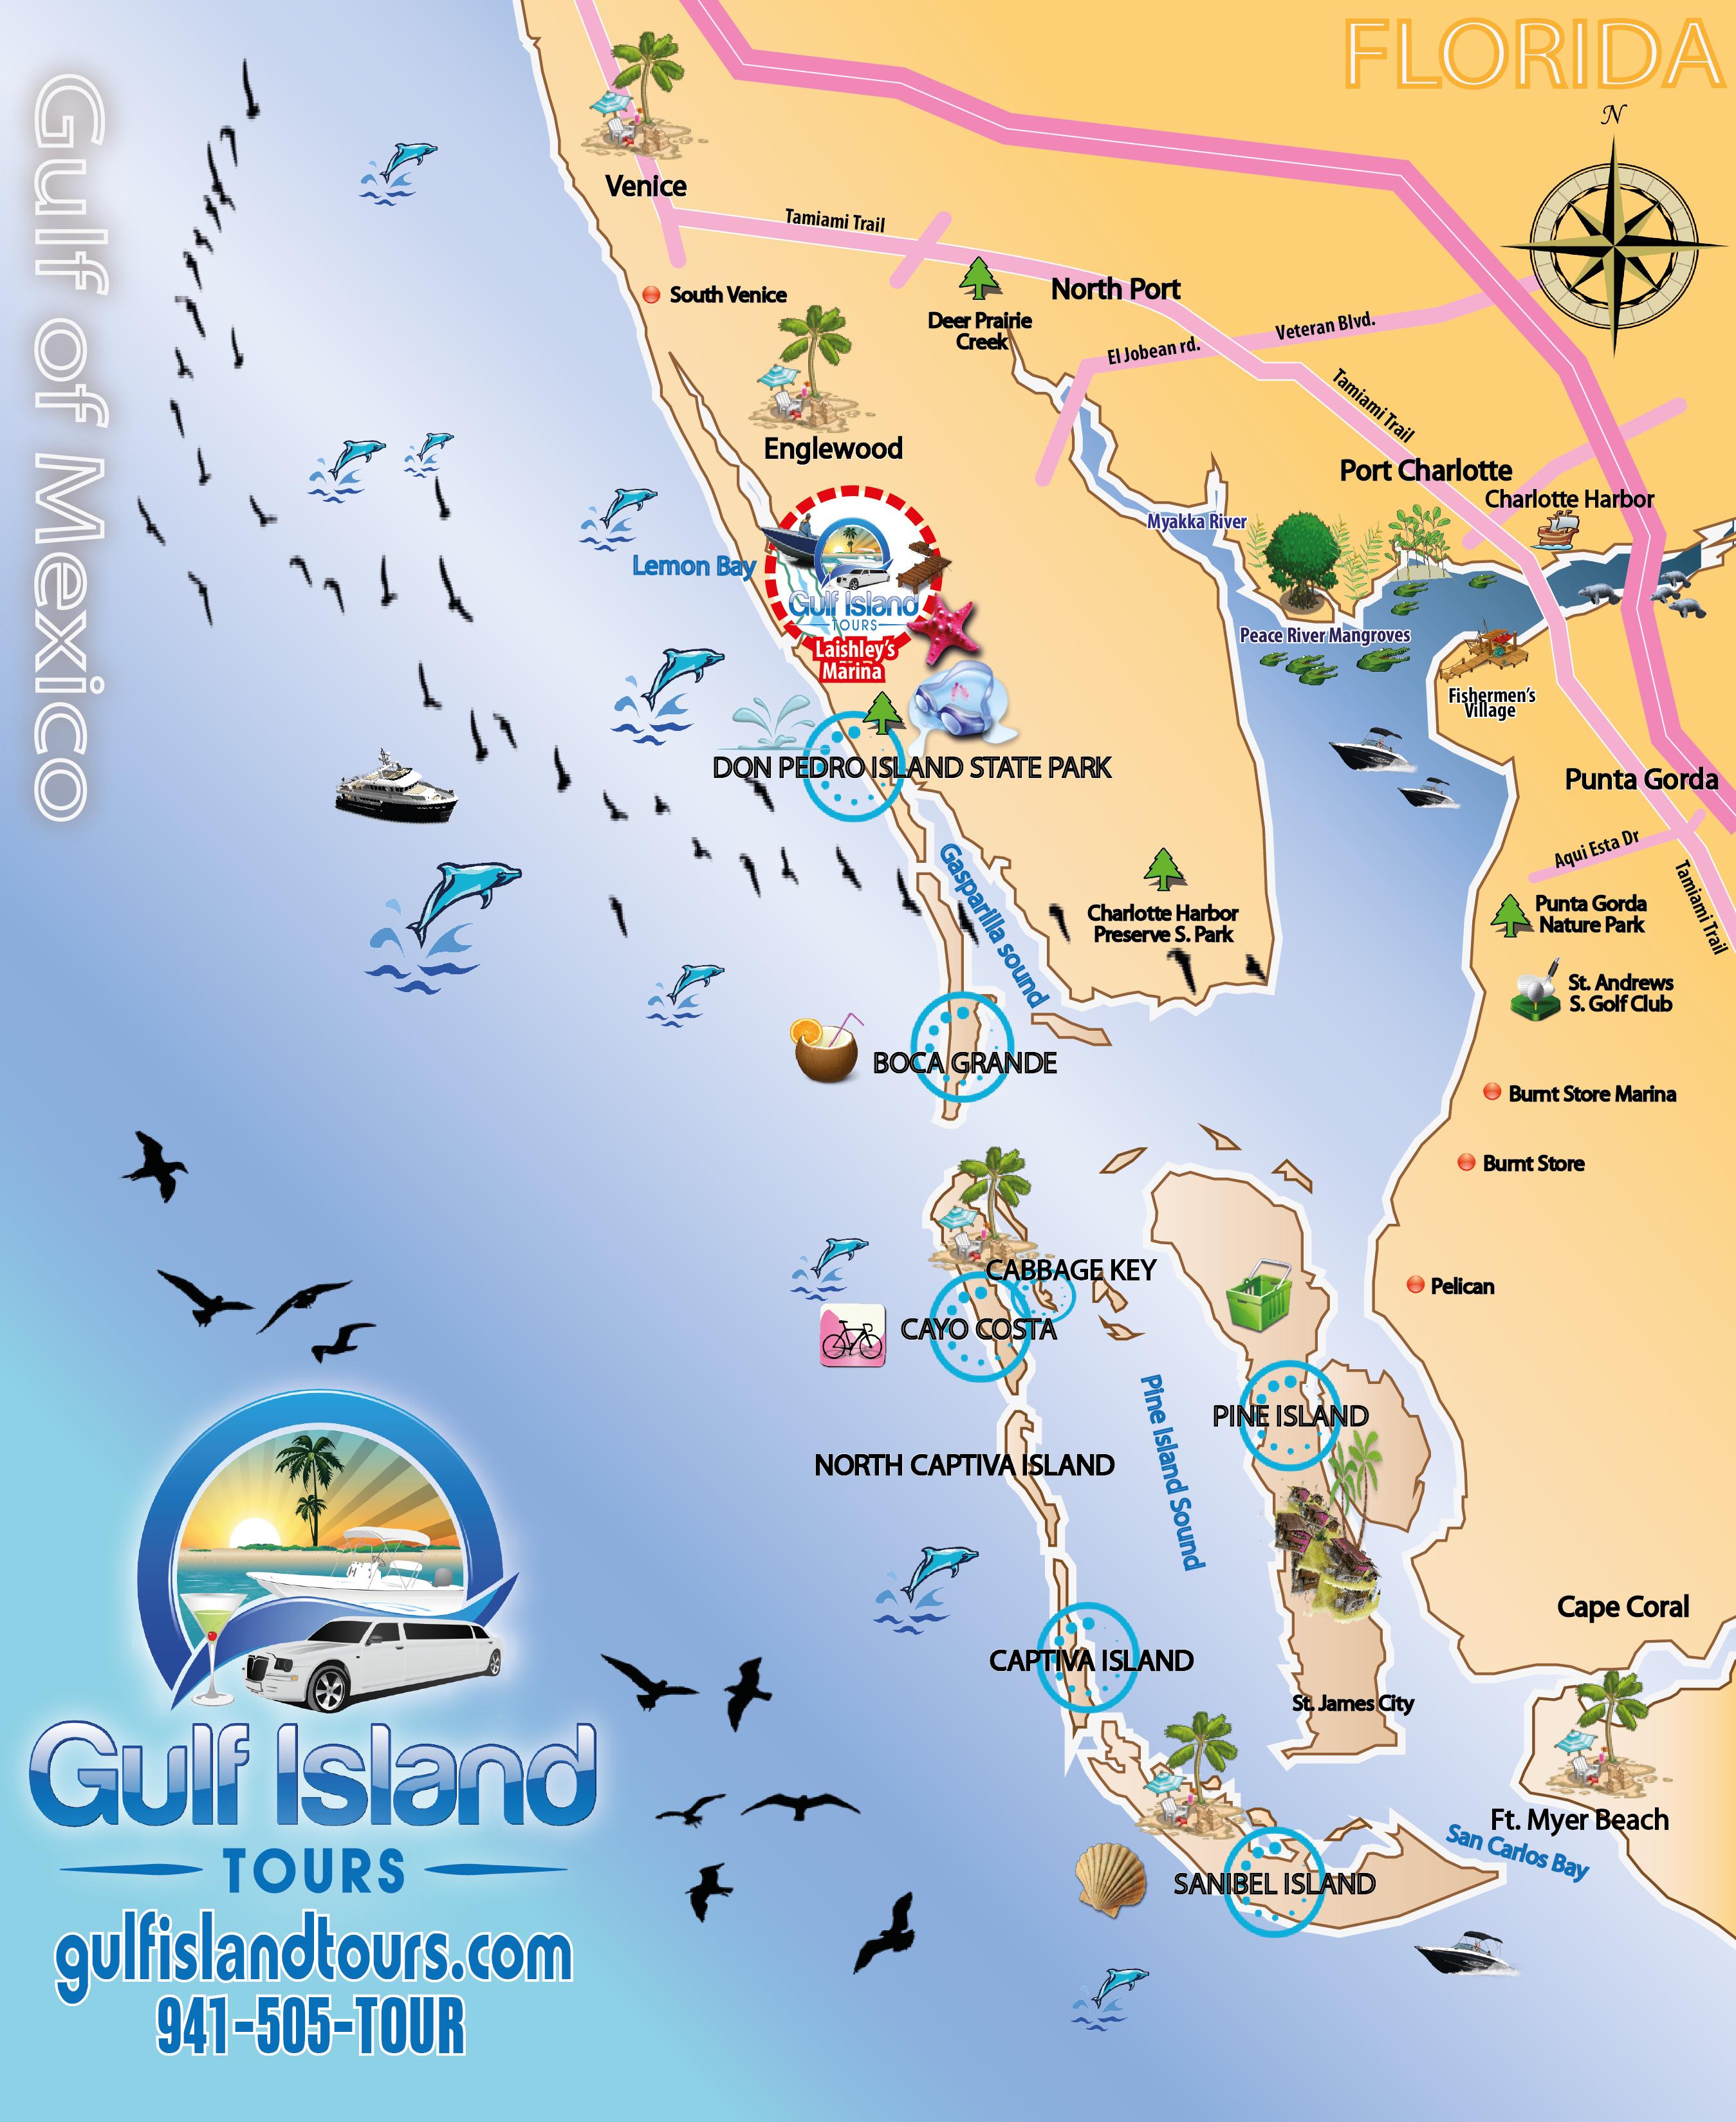 Boat Tours Englewood Fl - 941-505-8687 - Gulf Island Tours Offers - Manasota Key Florida Map